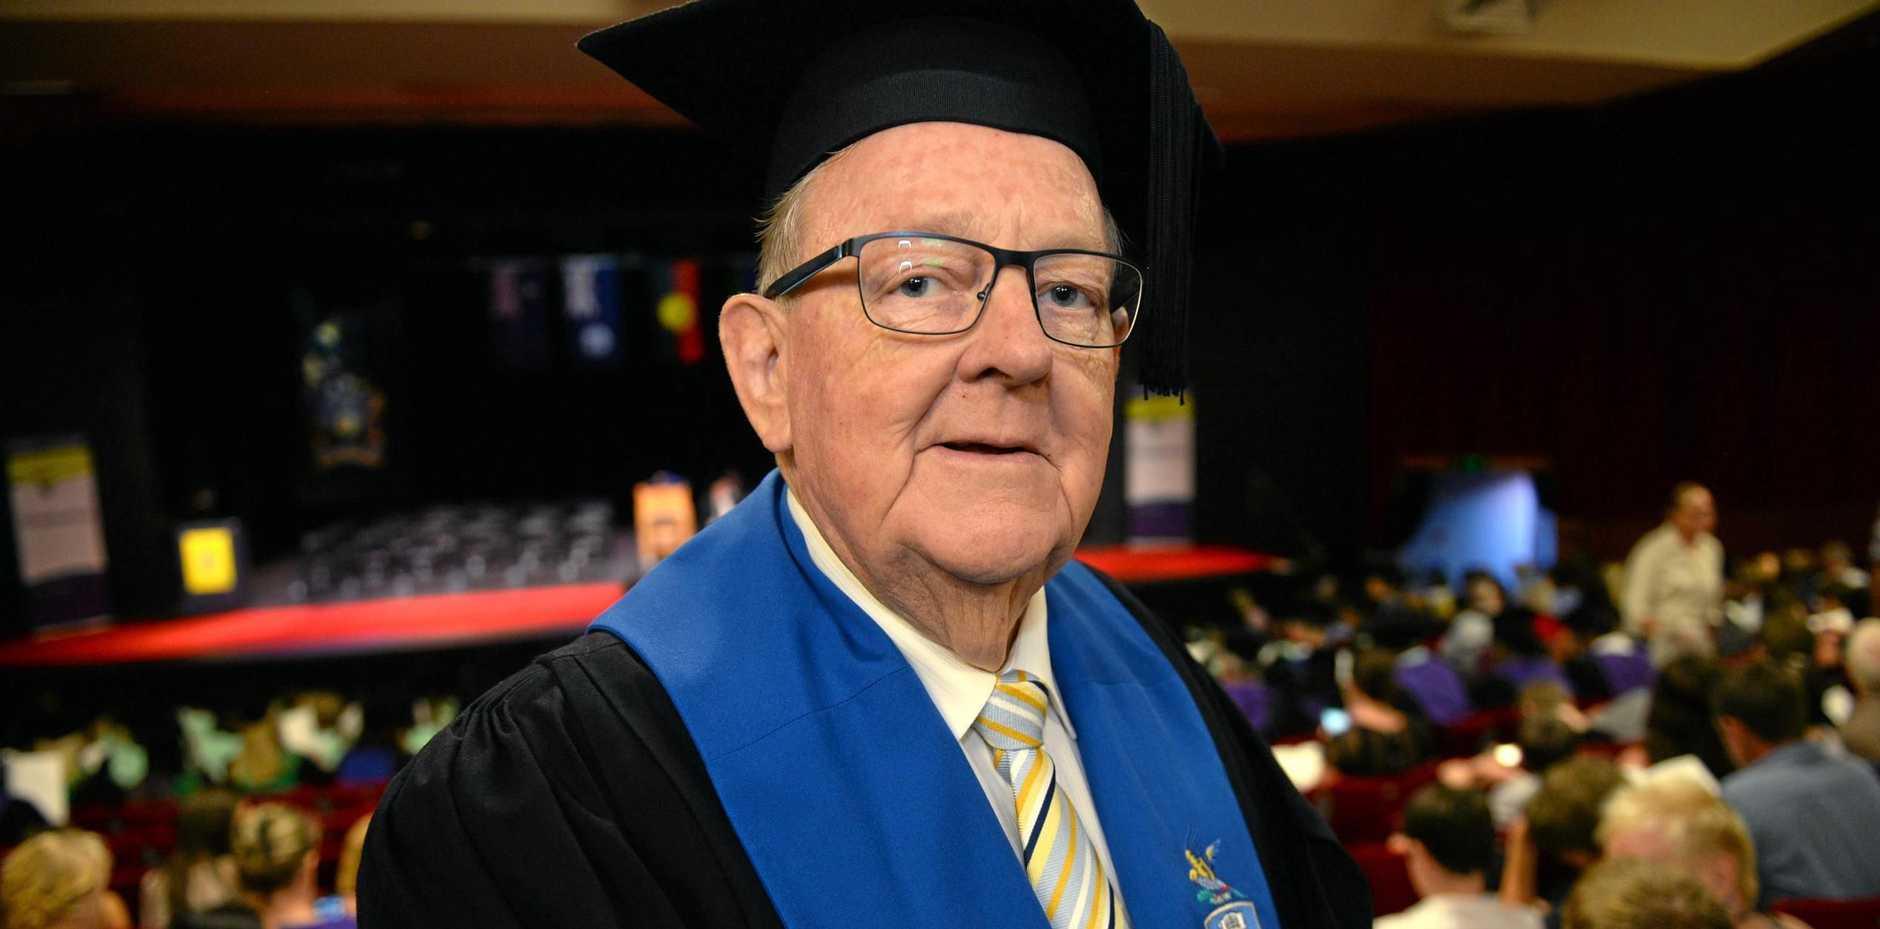 VALE: Paul Neville passed away overnight at Bundaberg Hospital